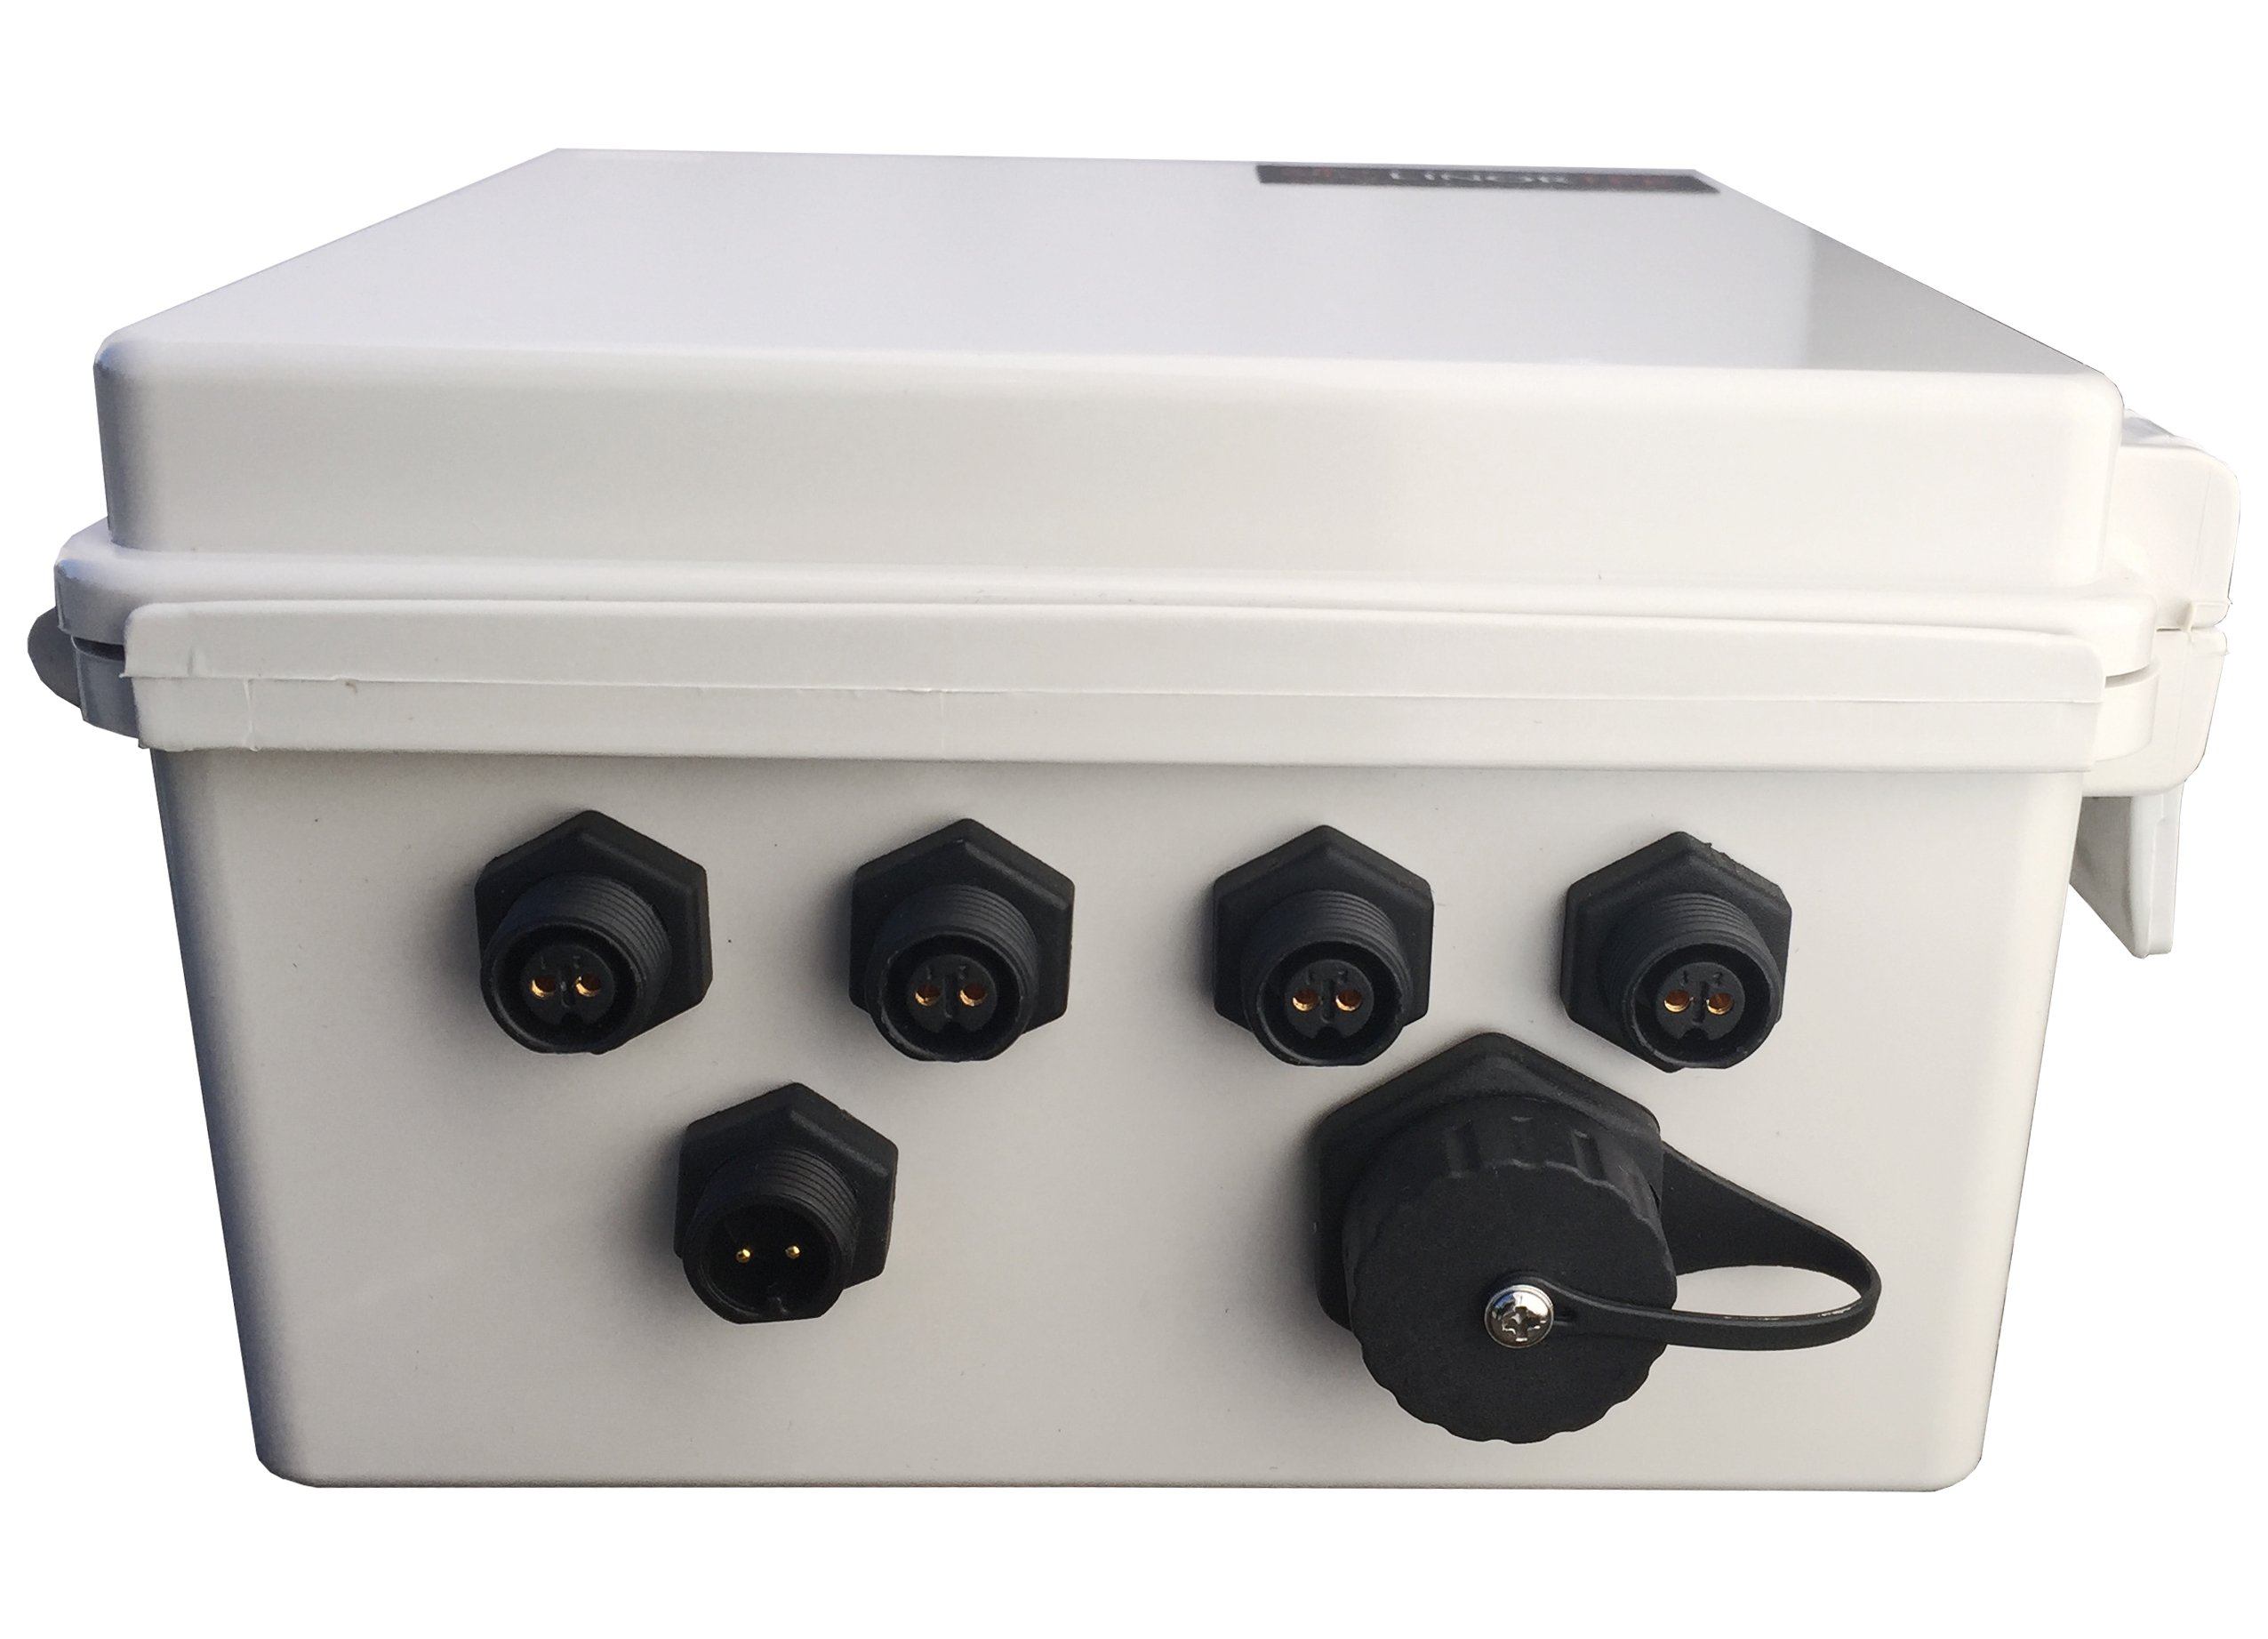 Linortek Netbell-4 TCP/IP Ethernet 4 Zone Bell Ringer Web-based Bell Controller for Alarm Signal Bell/Horn/Buzzer and Other Timed Equipment POE by Linortek (Image #3)